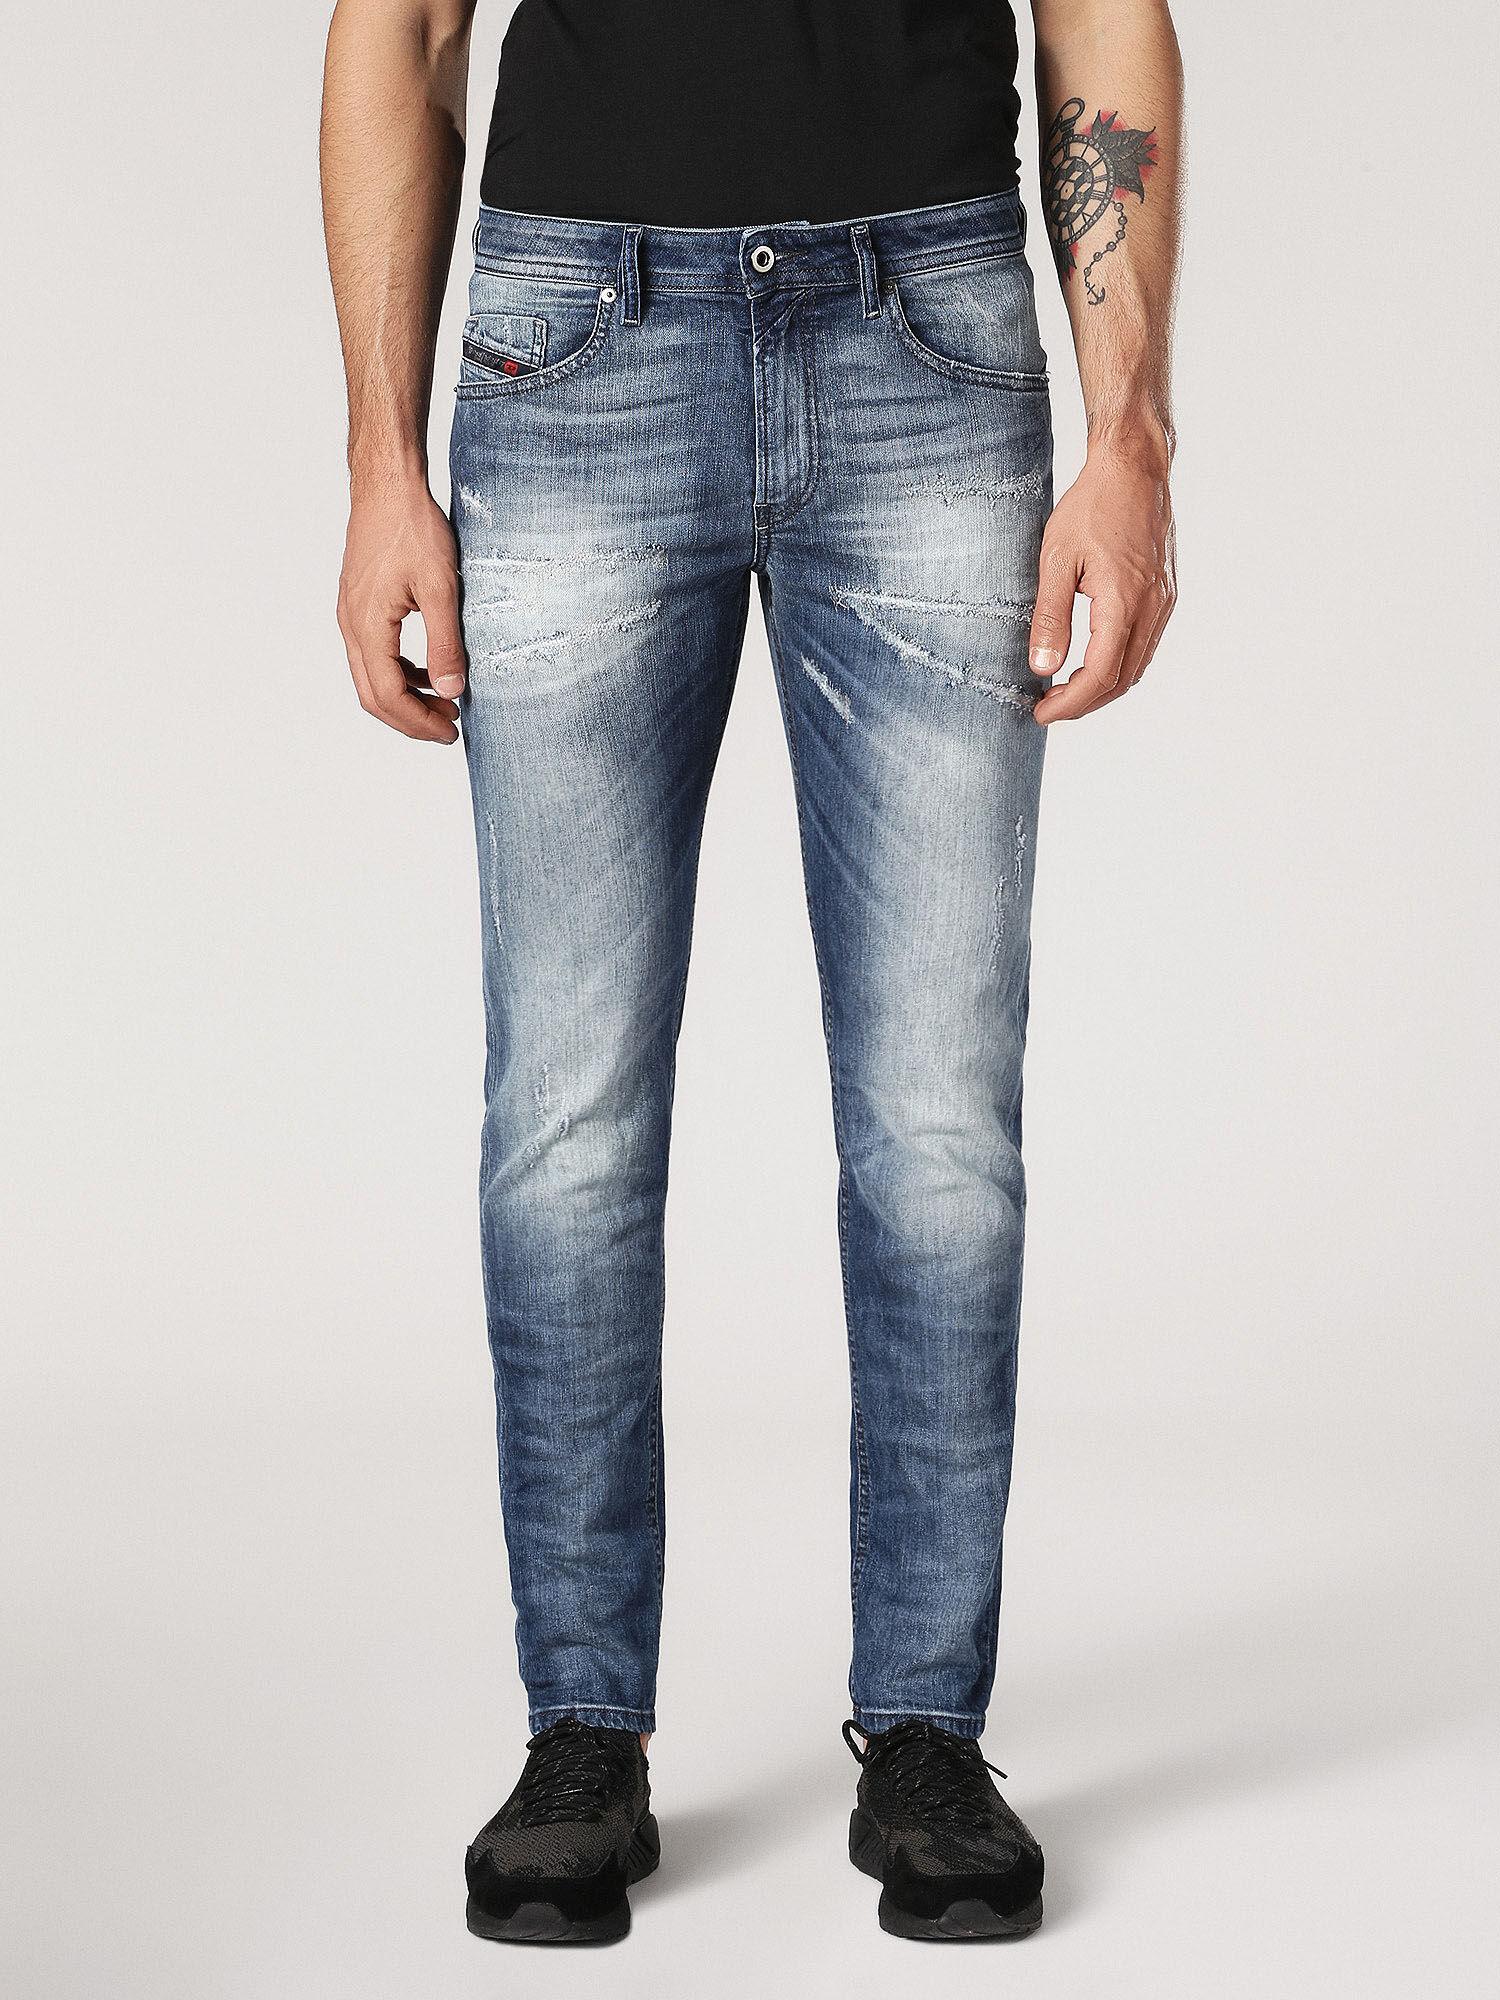 Jogging homme jeans industry